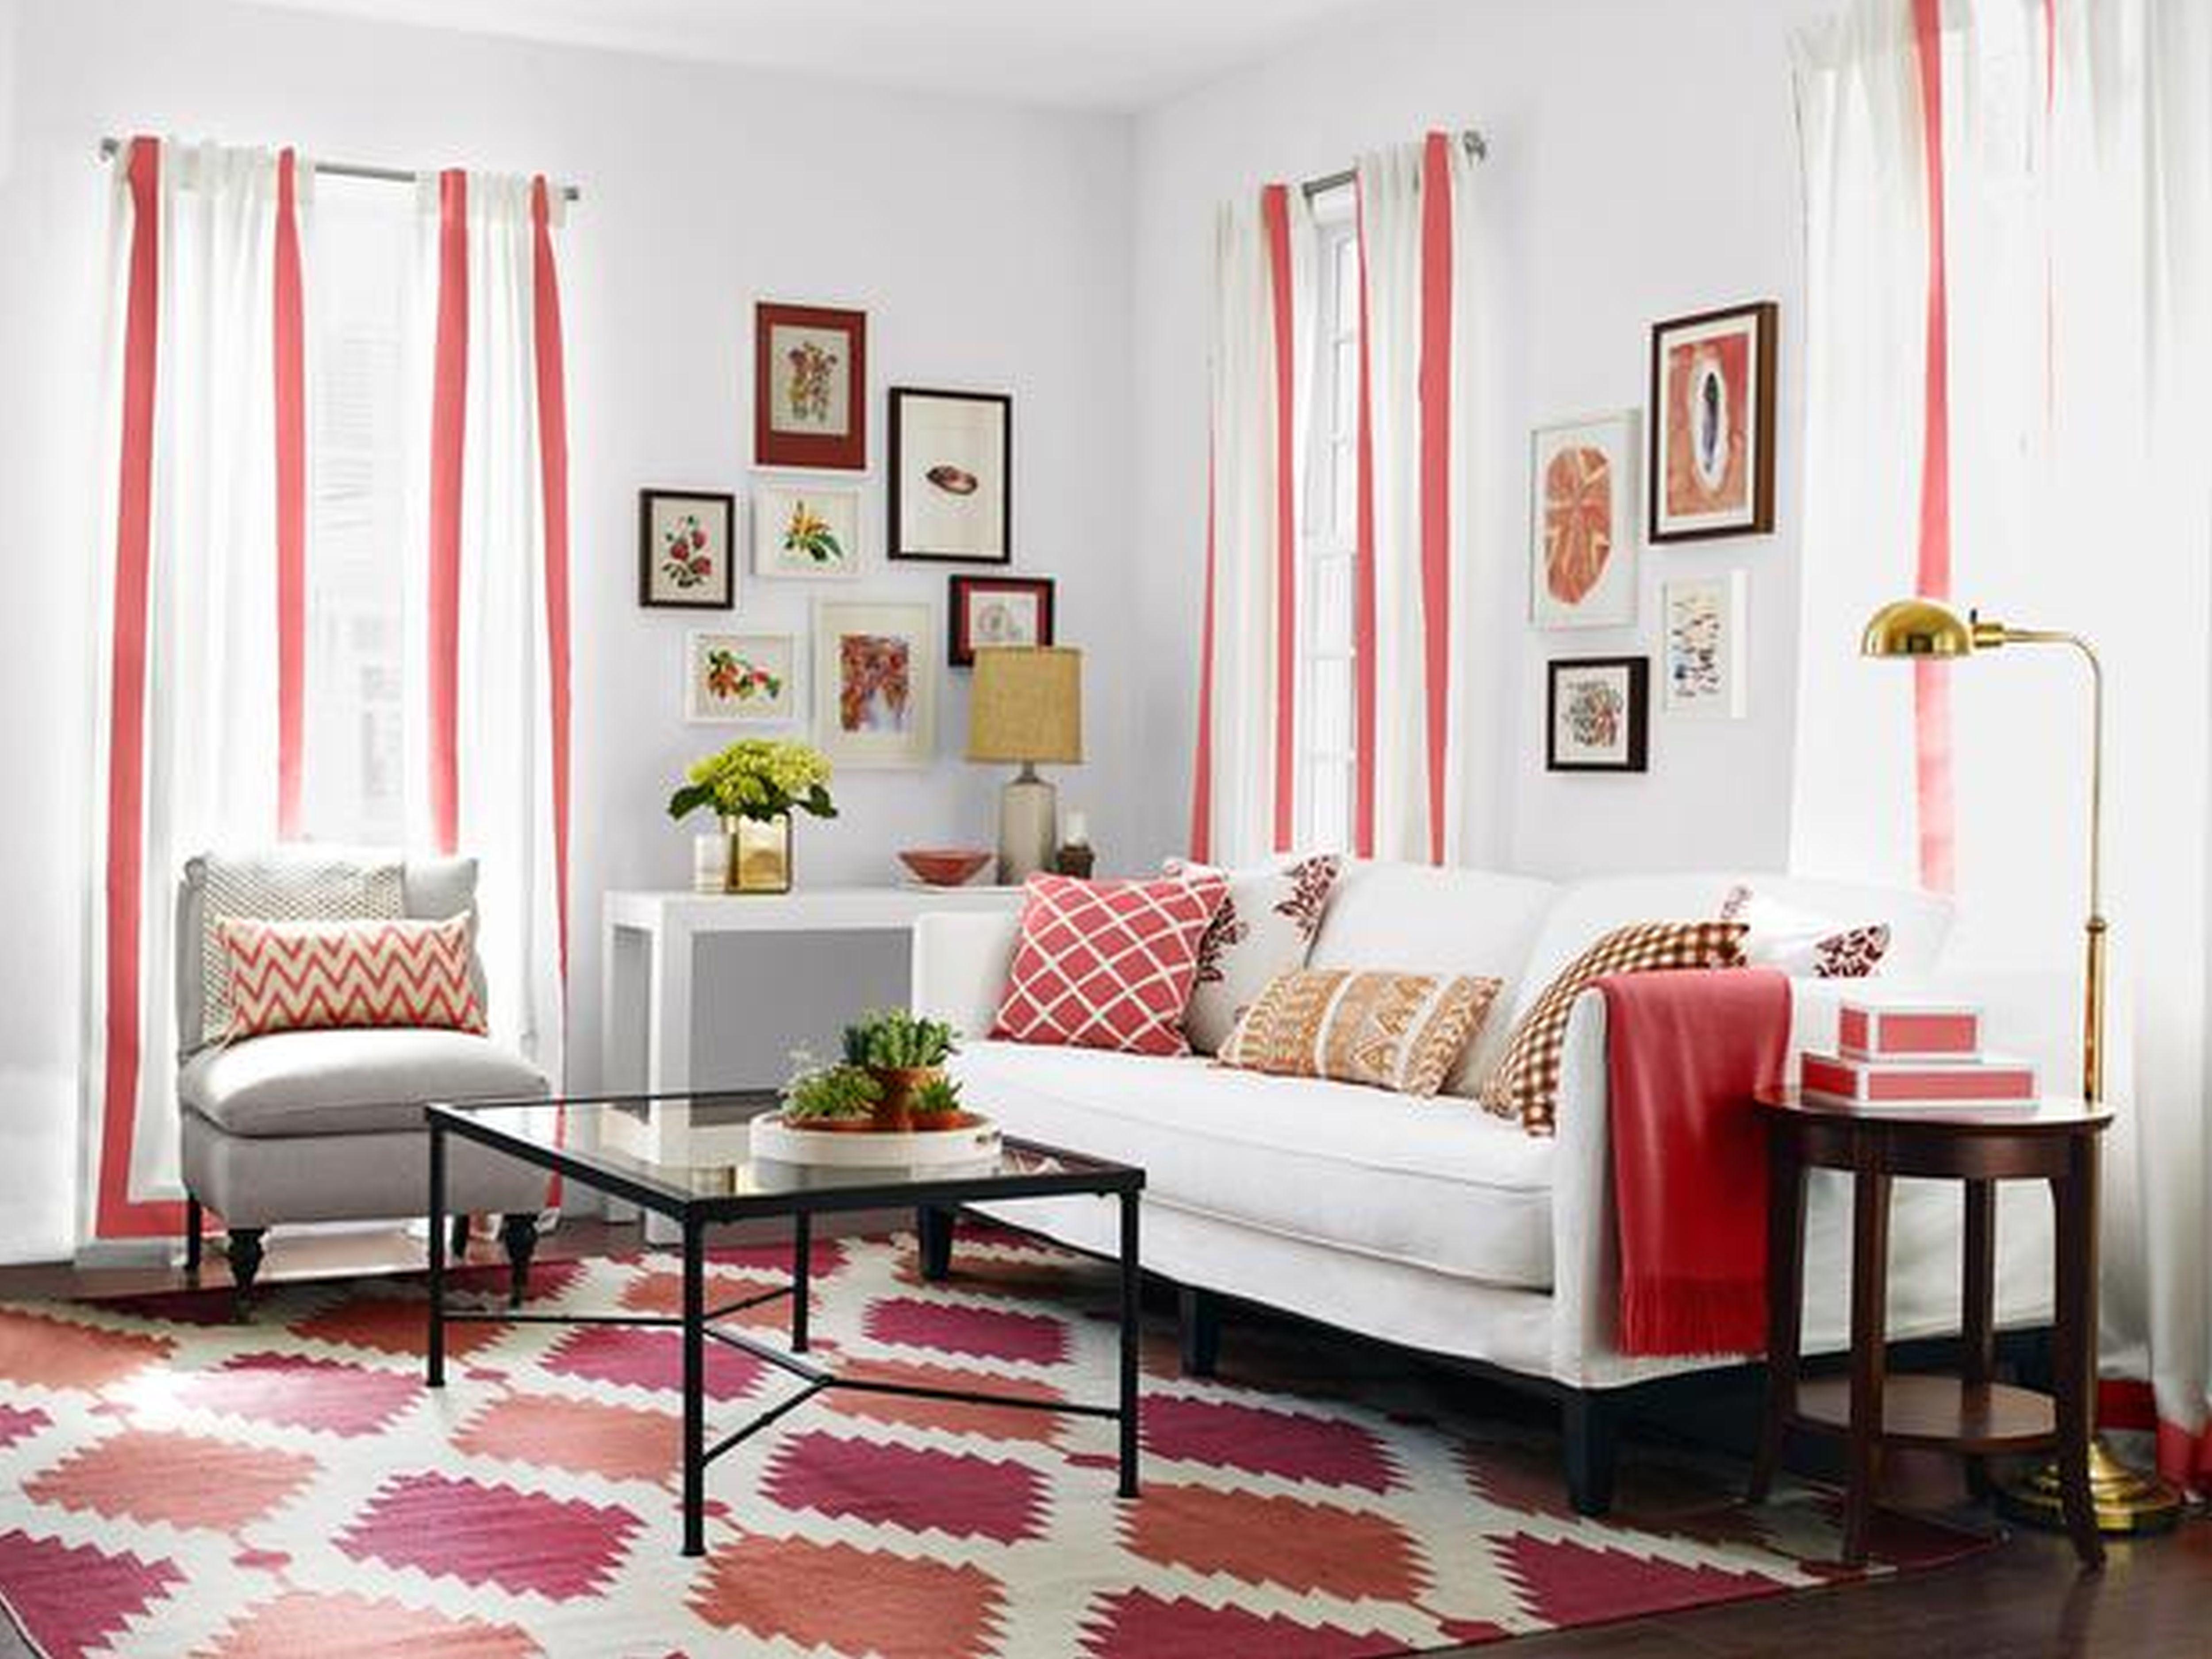 rug sofas pillows table pics curtains lamps - Diy Home Design Ideas